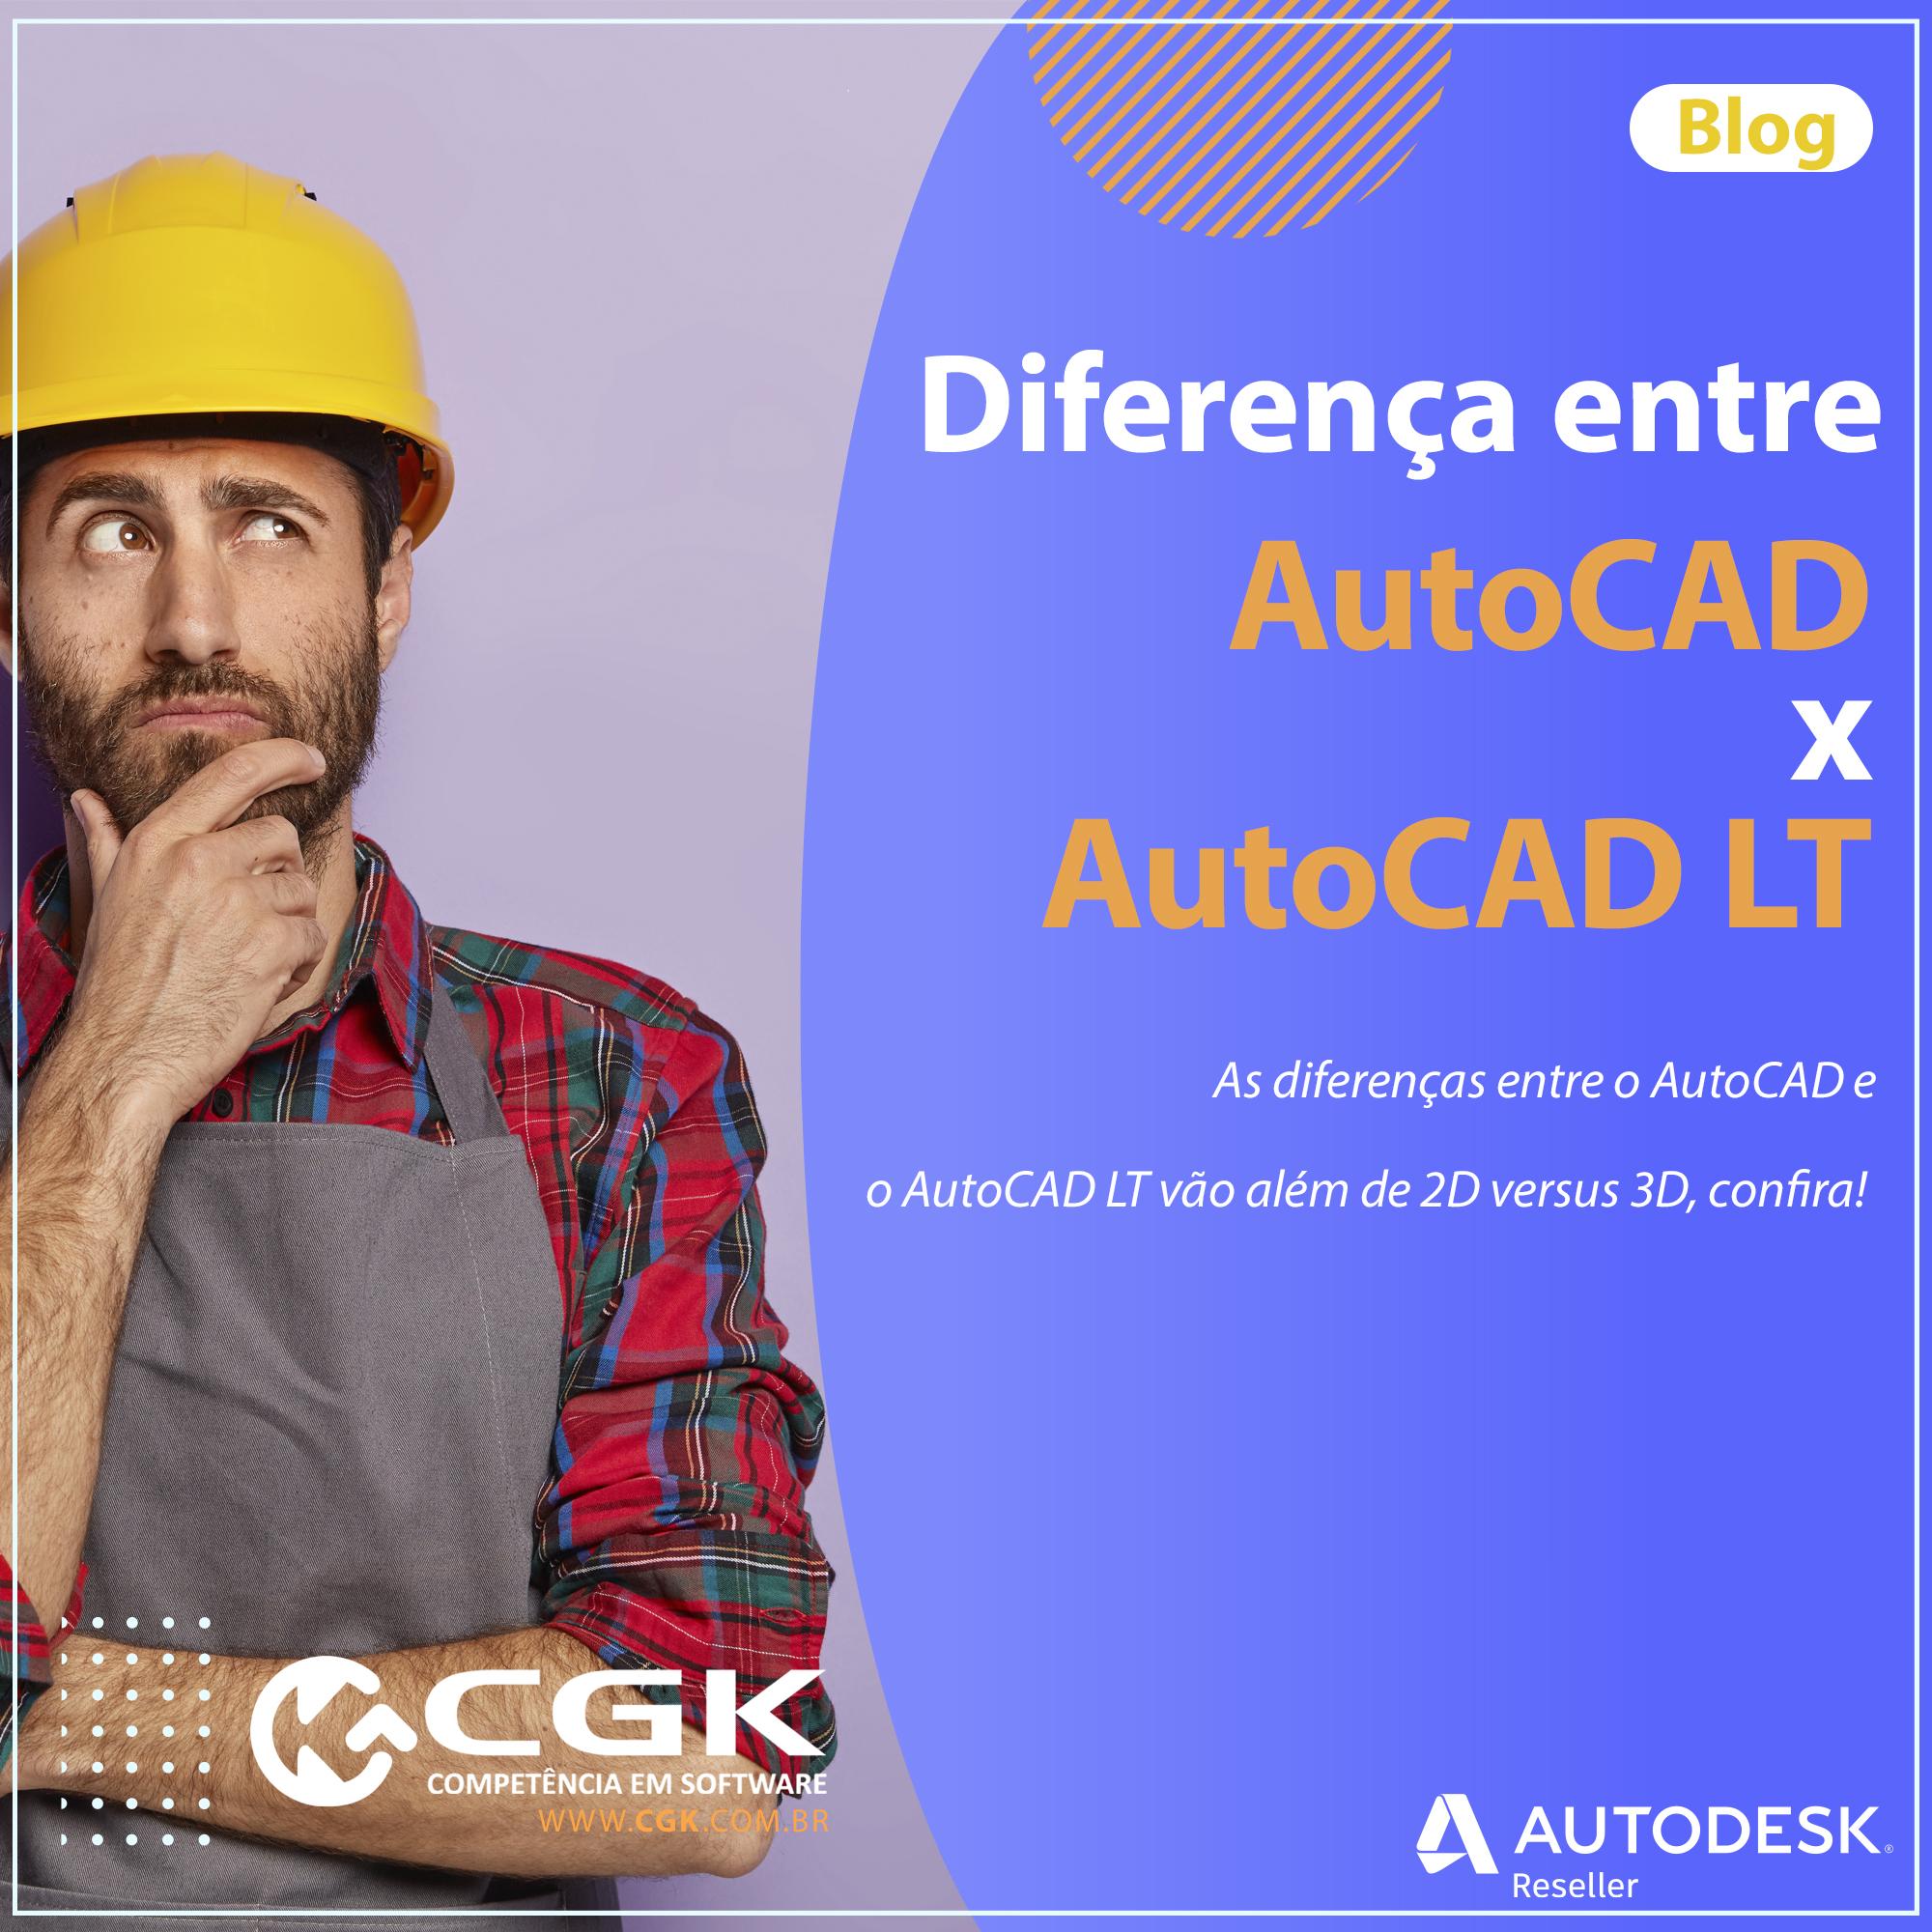 Diferenças entre o AutoCAD versus AutoCAD LT